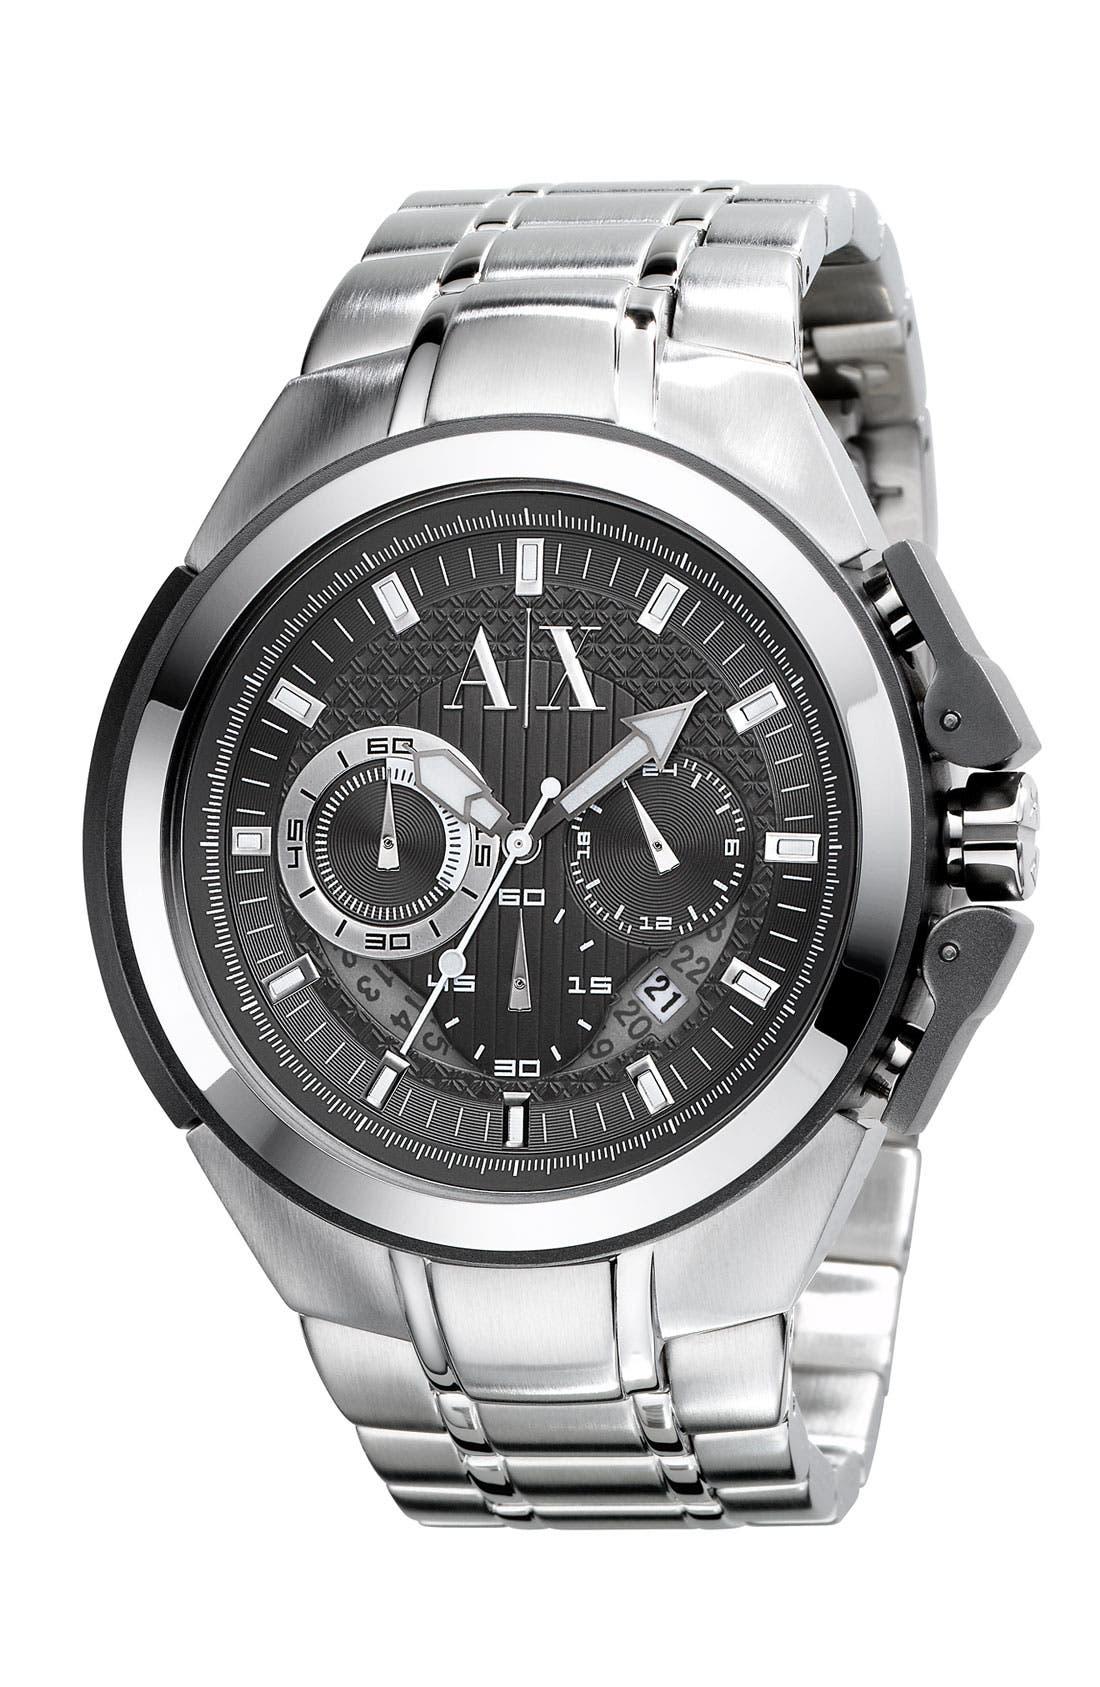 Main Image - AX Armani Exchange Men's Chronograph Watch